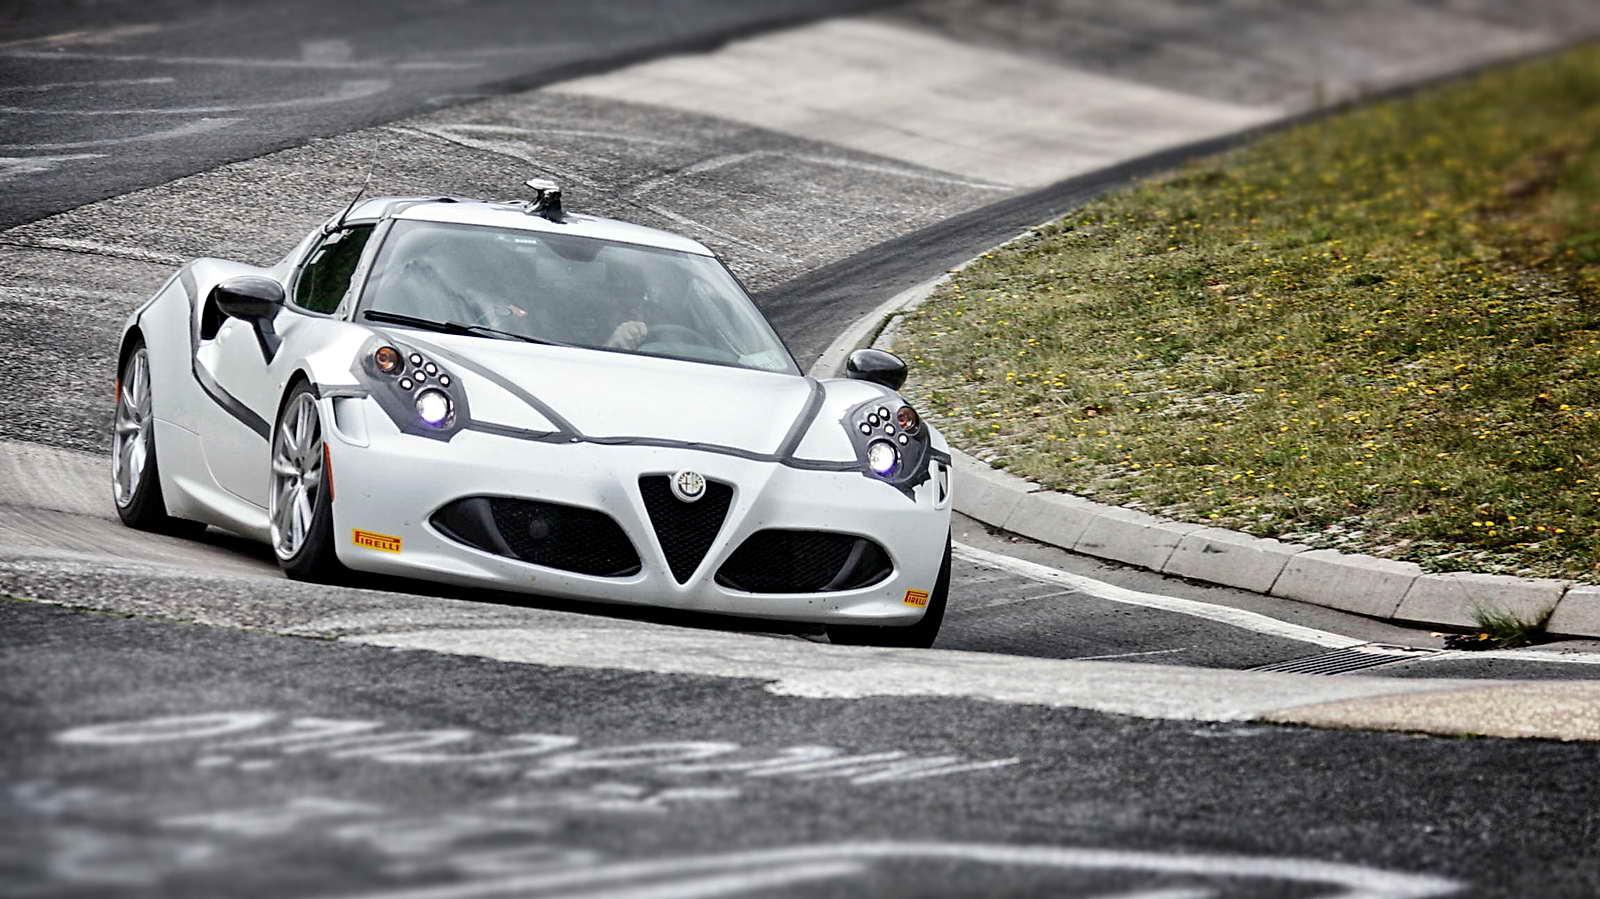 Alfa_Romeo_4C_Record_Nurburgring_01